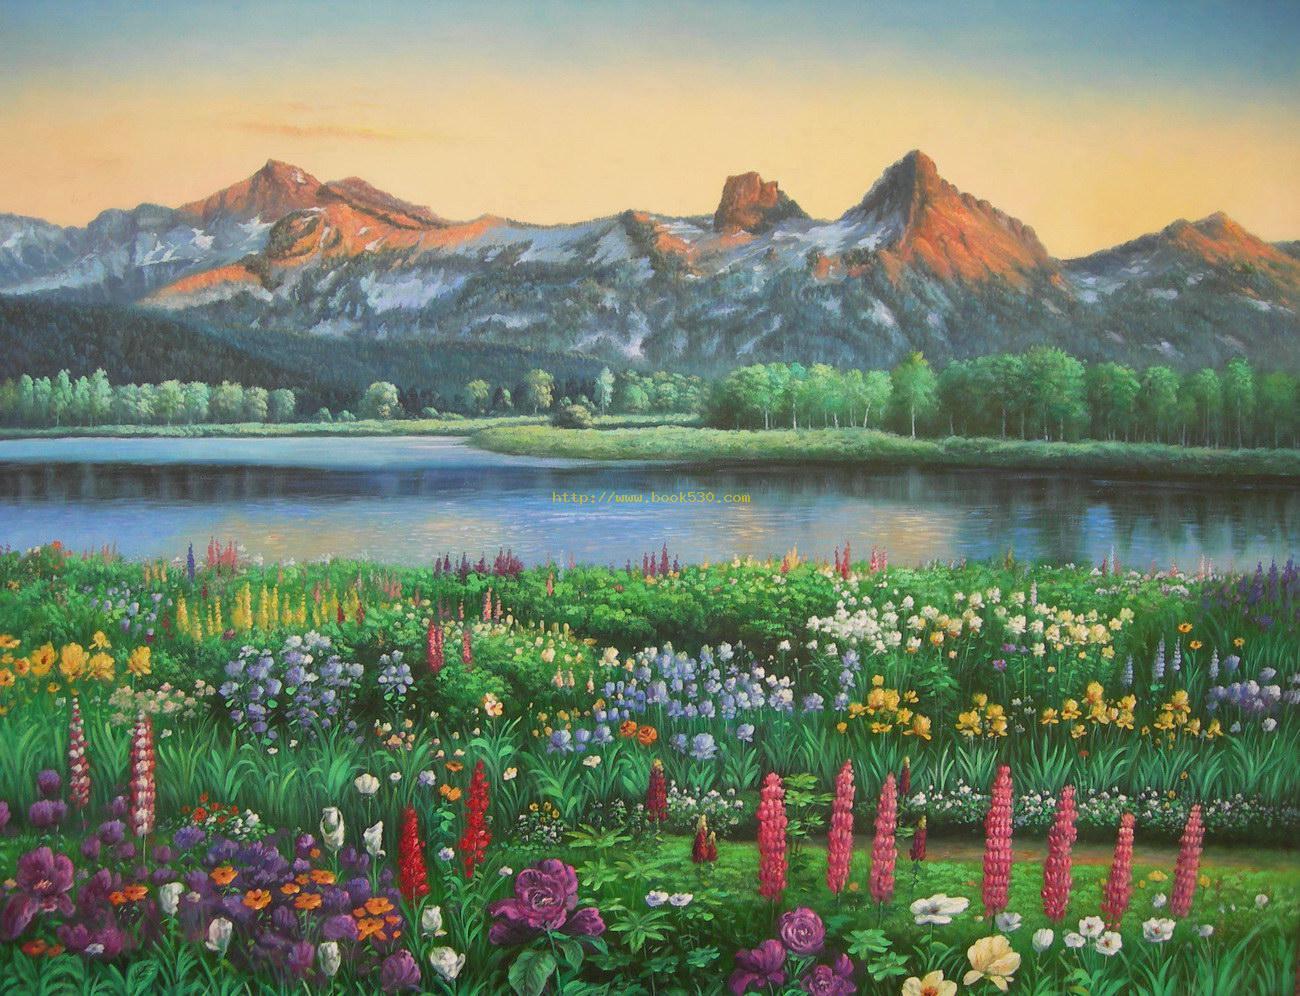 Oil painting scenery for Oil painting scenery